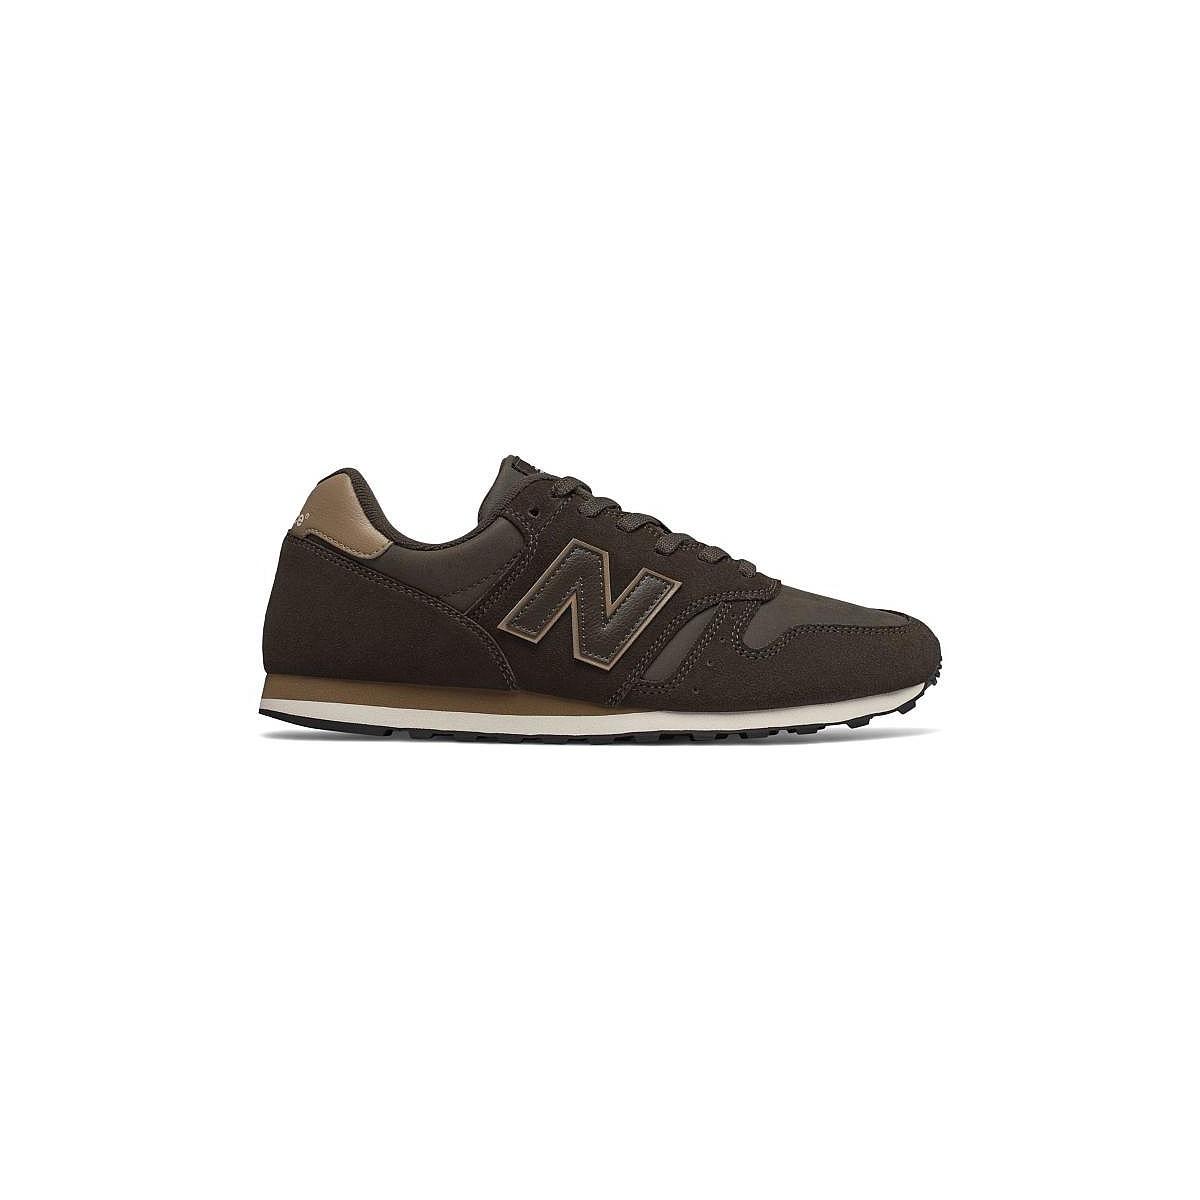 sneakers new balance ml373 marrón hombre